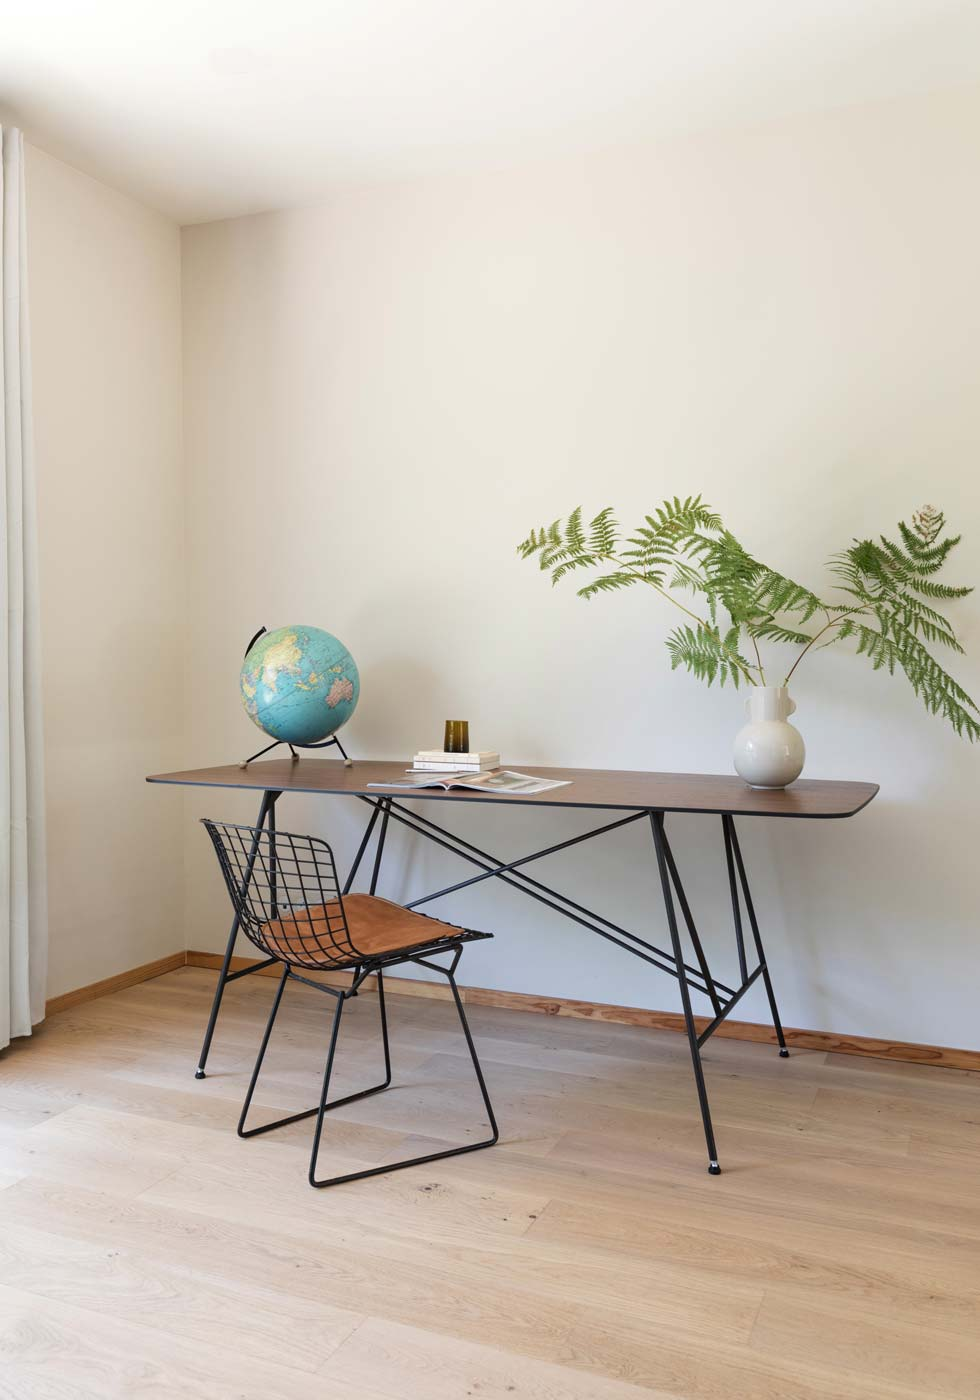 Gustave architect desk